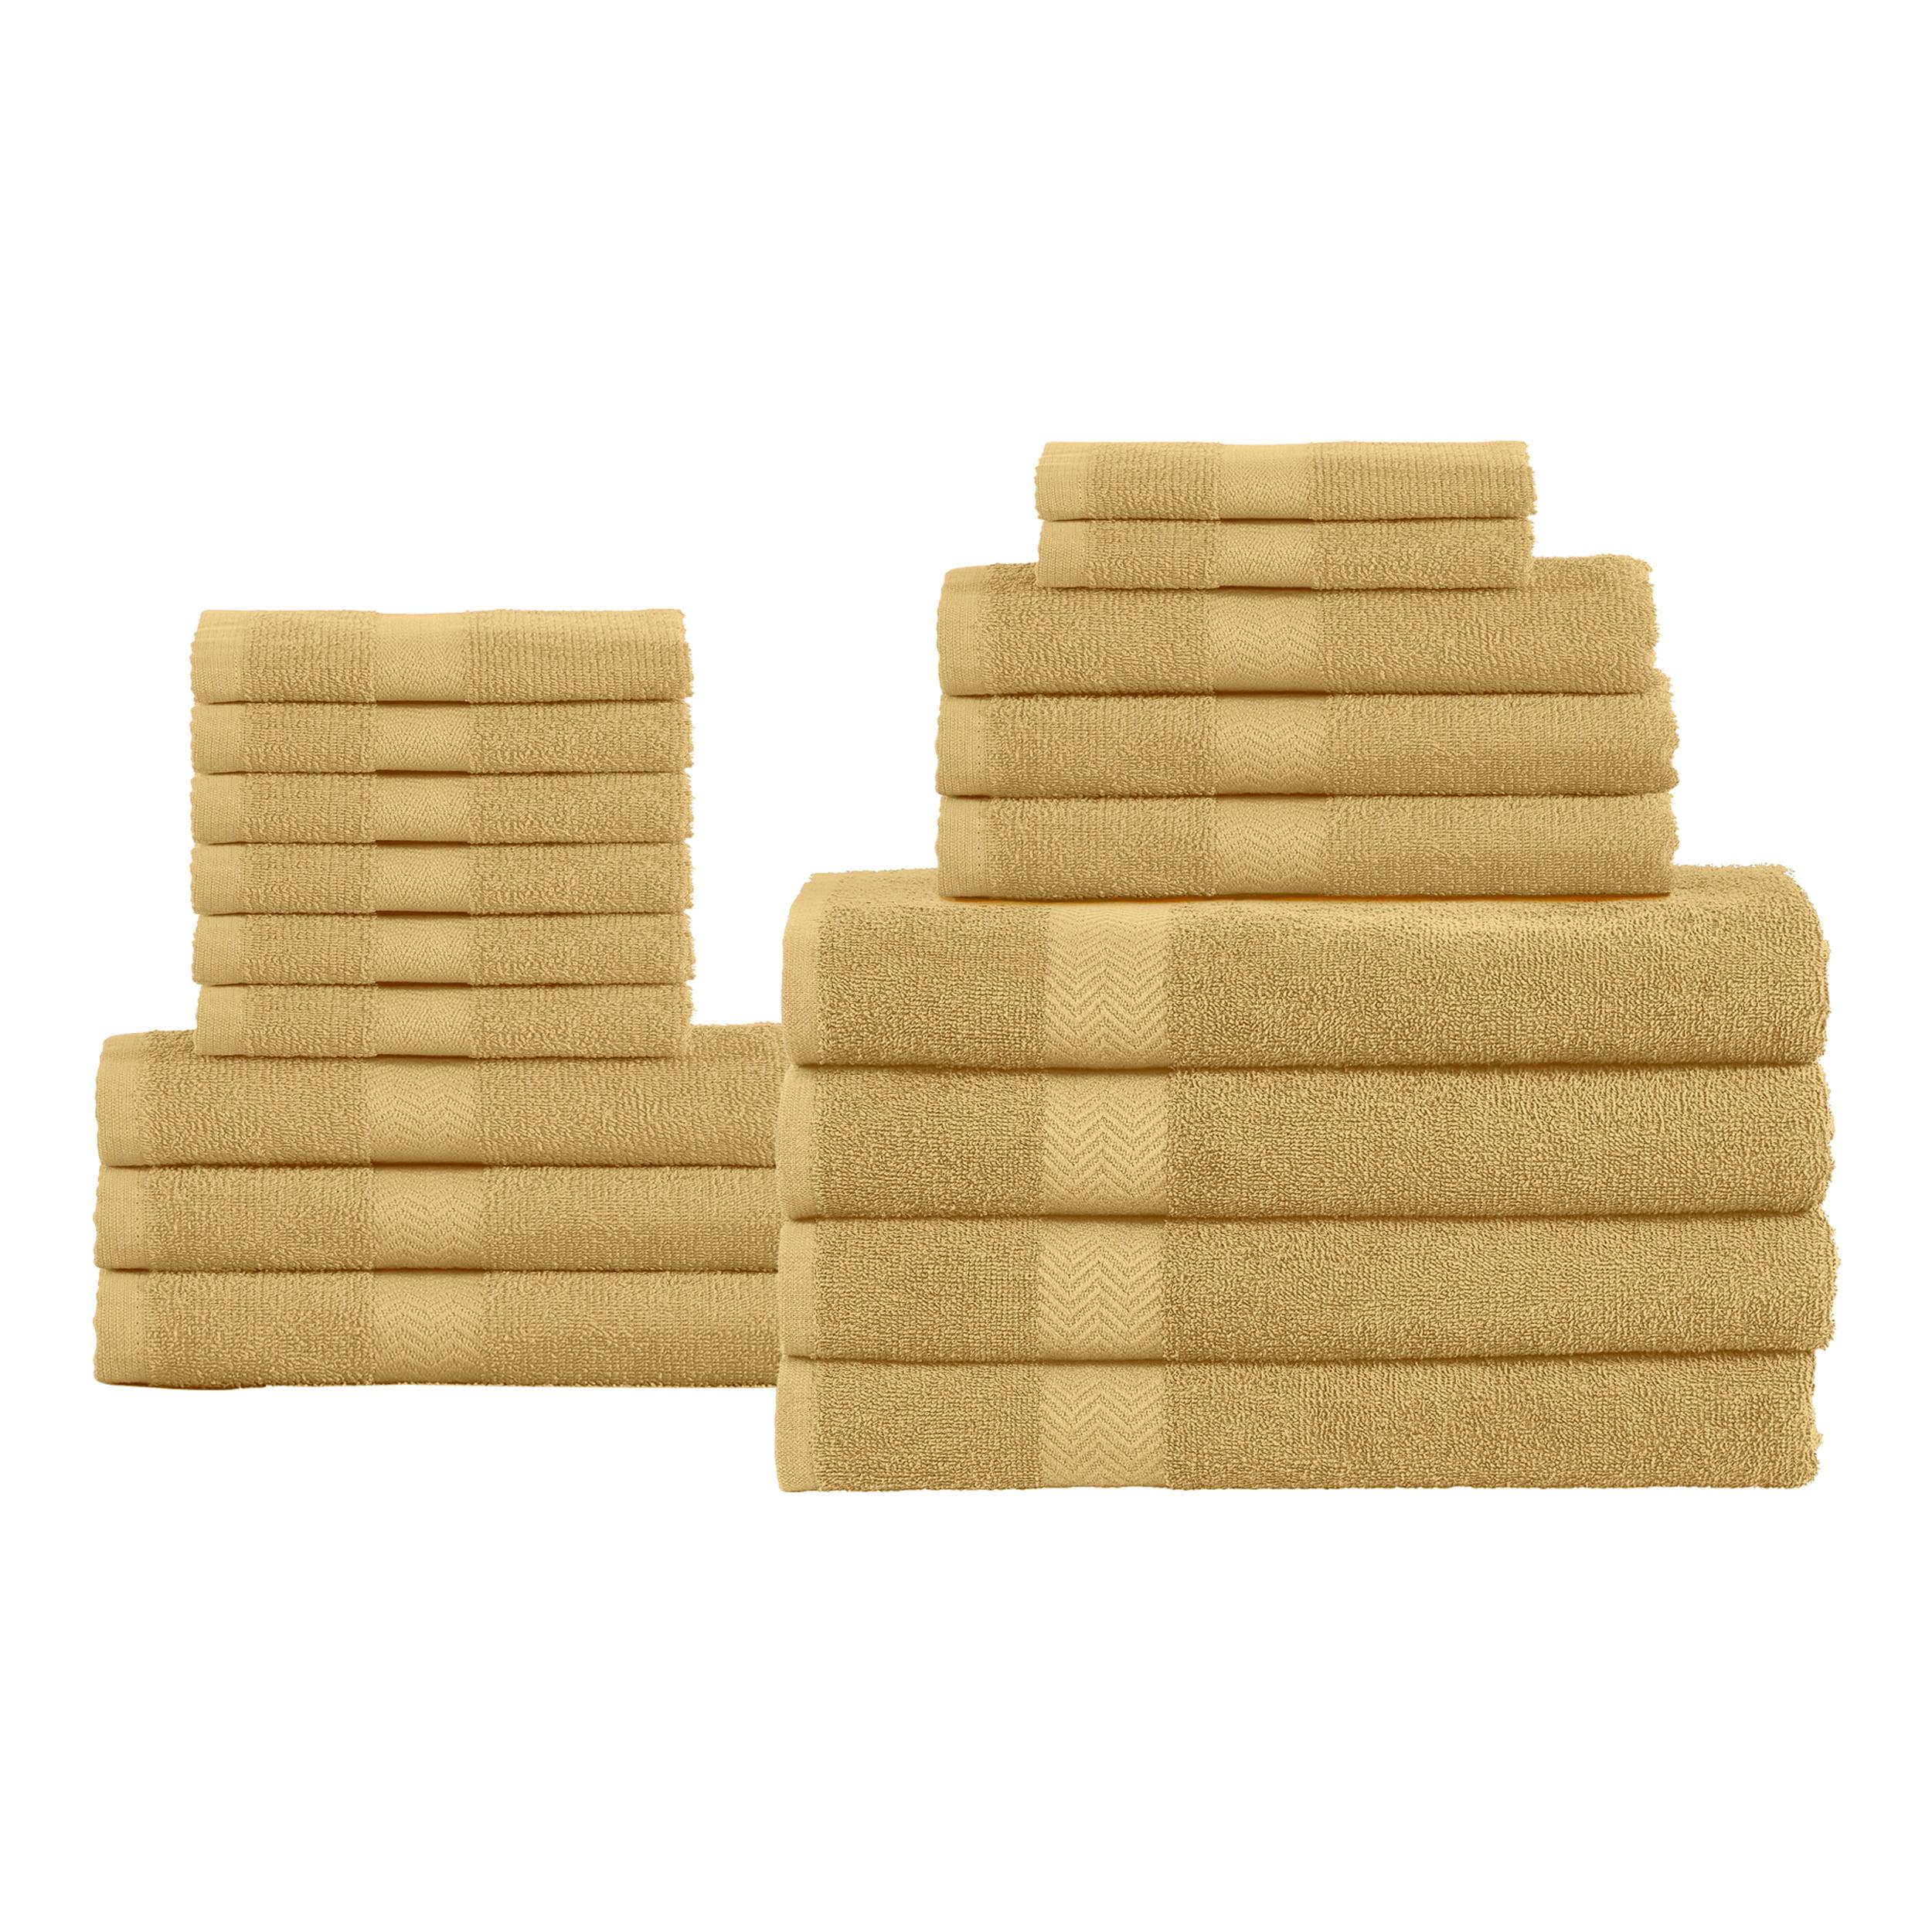 Superior 100-Percent Cotton Eco-Friendly 18-Piece Towel Set - Black